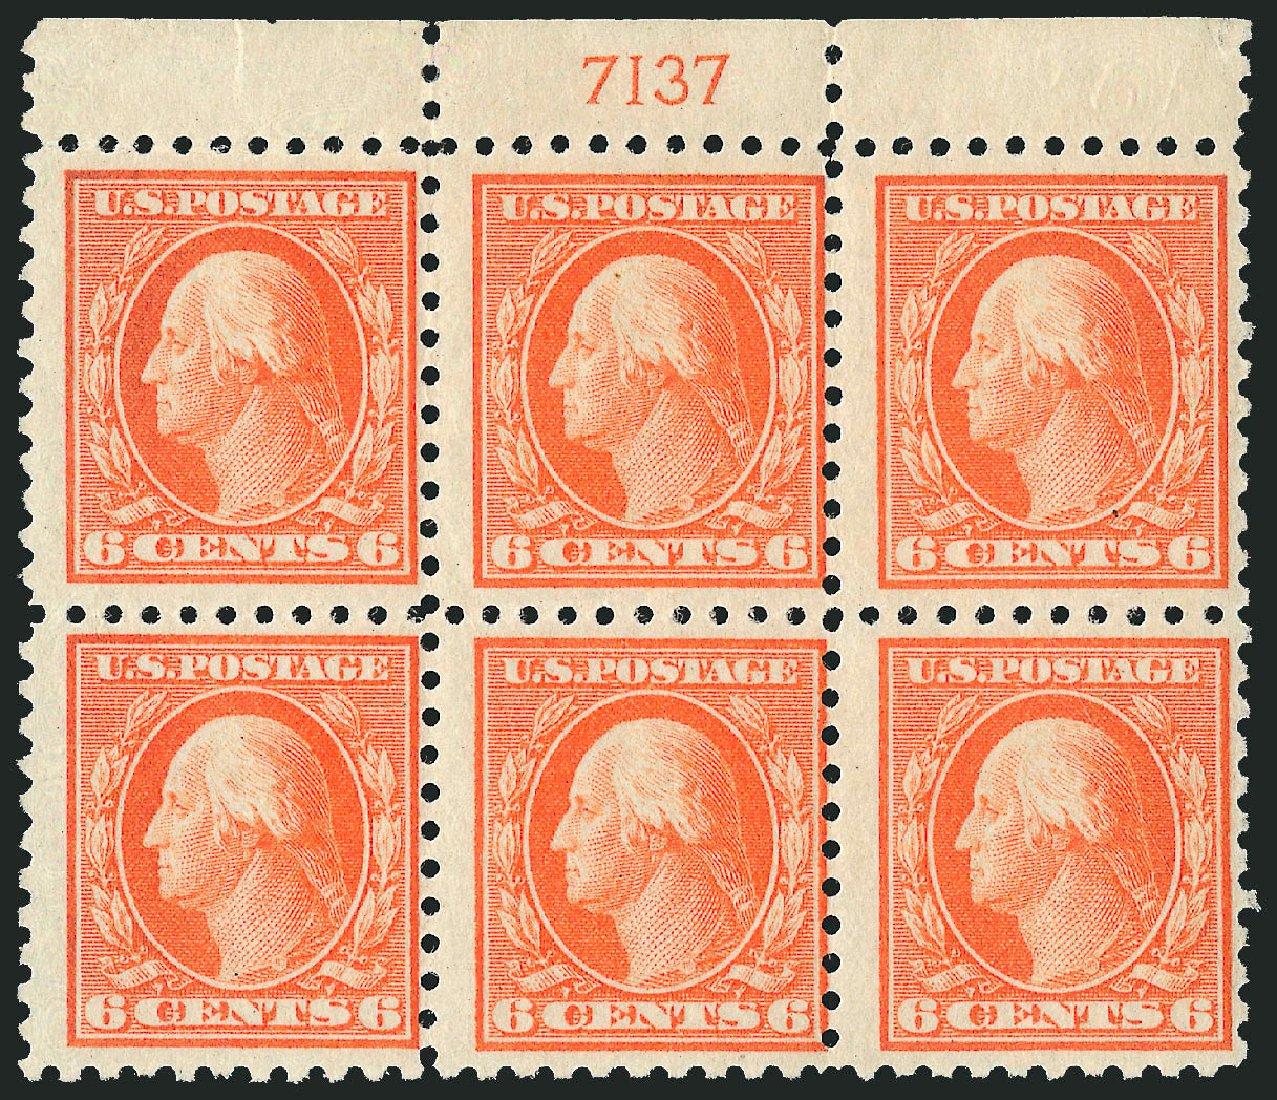 Cost of US Stamp Scott Cat. 468 - 1916 6c Washington Perf 10. Robert Siegel Auction Galleries, Jul 2014, Sale 1077, Lot 282